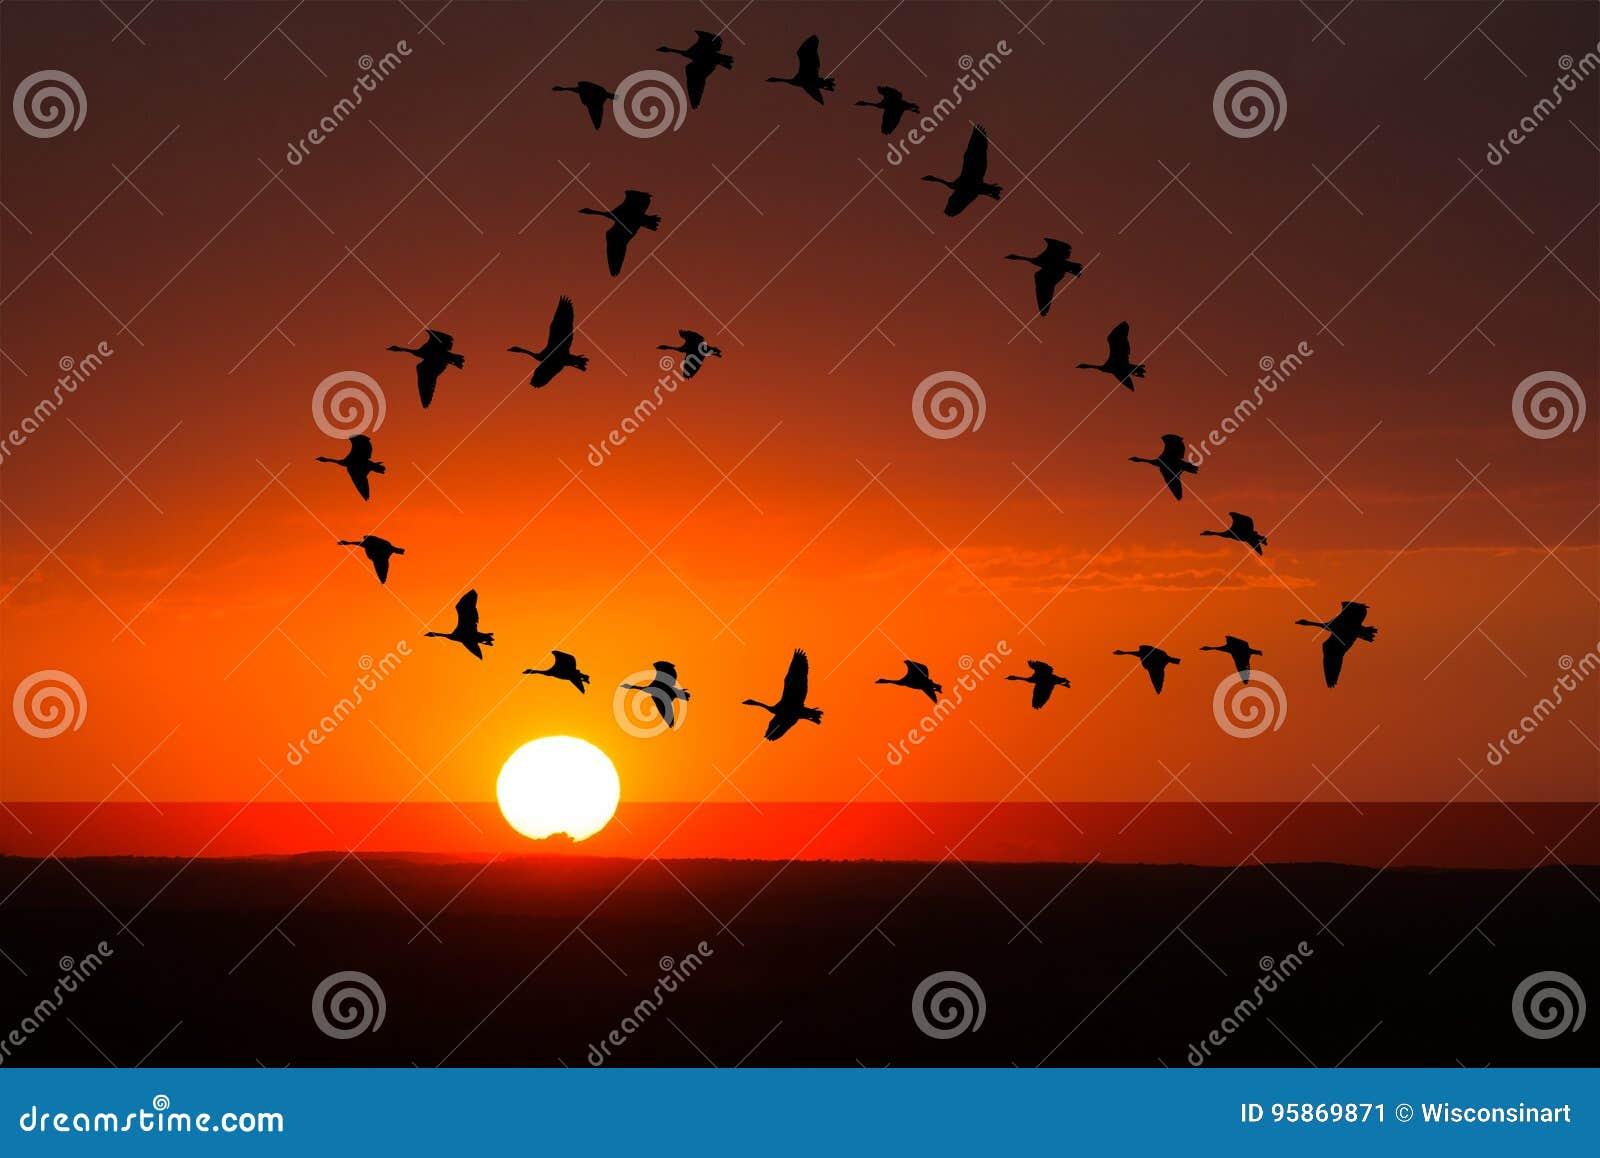 Sunrise Sunset Love Romance Birds Stock Image Image Of Bird